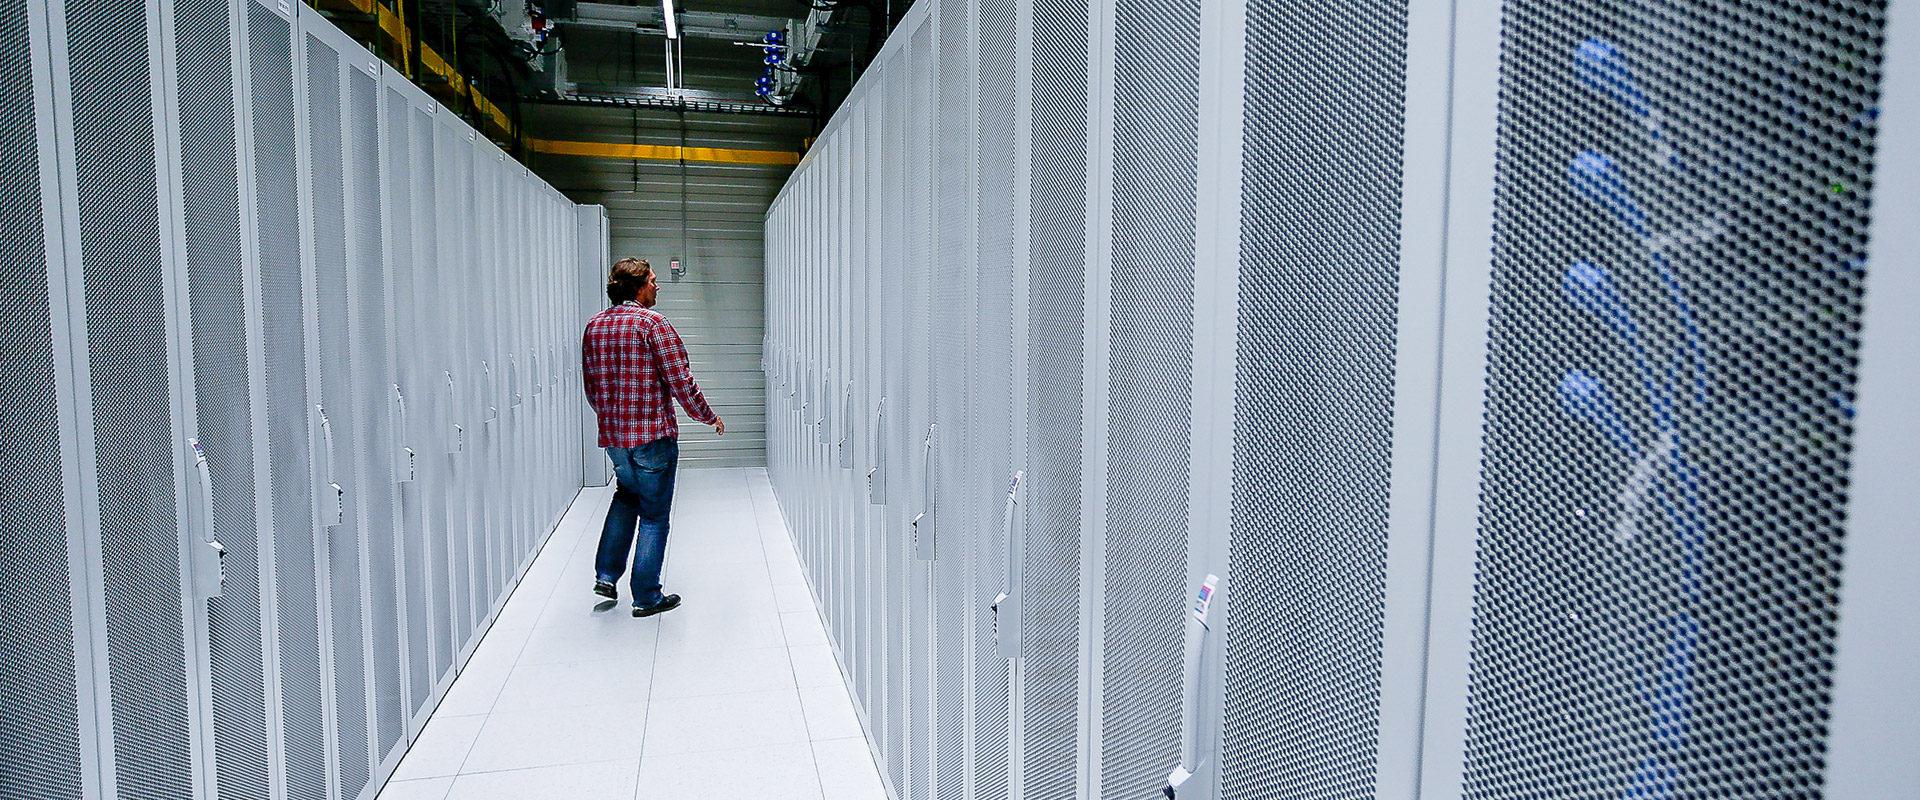 2 1 2 Datacenters Full Image